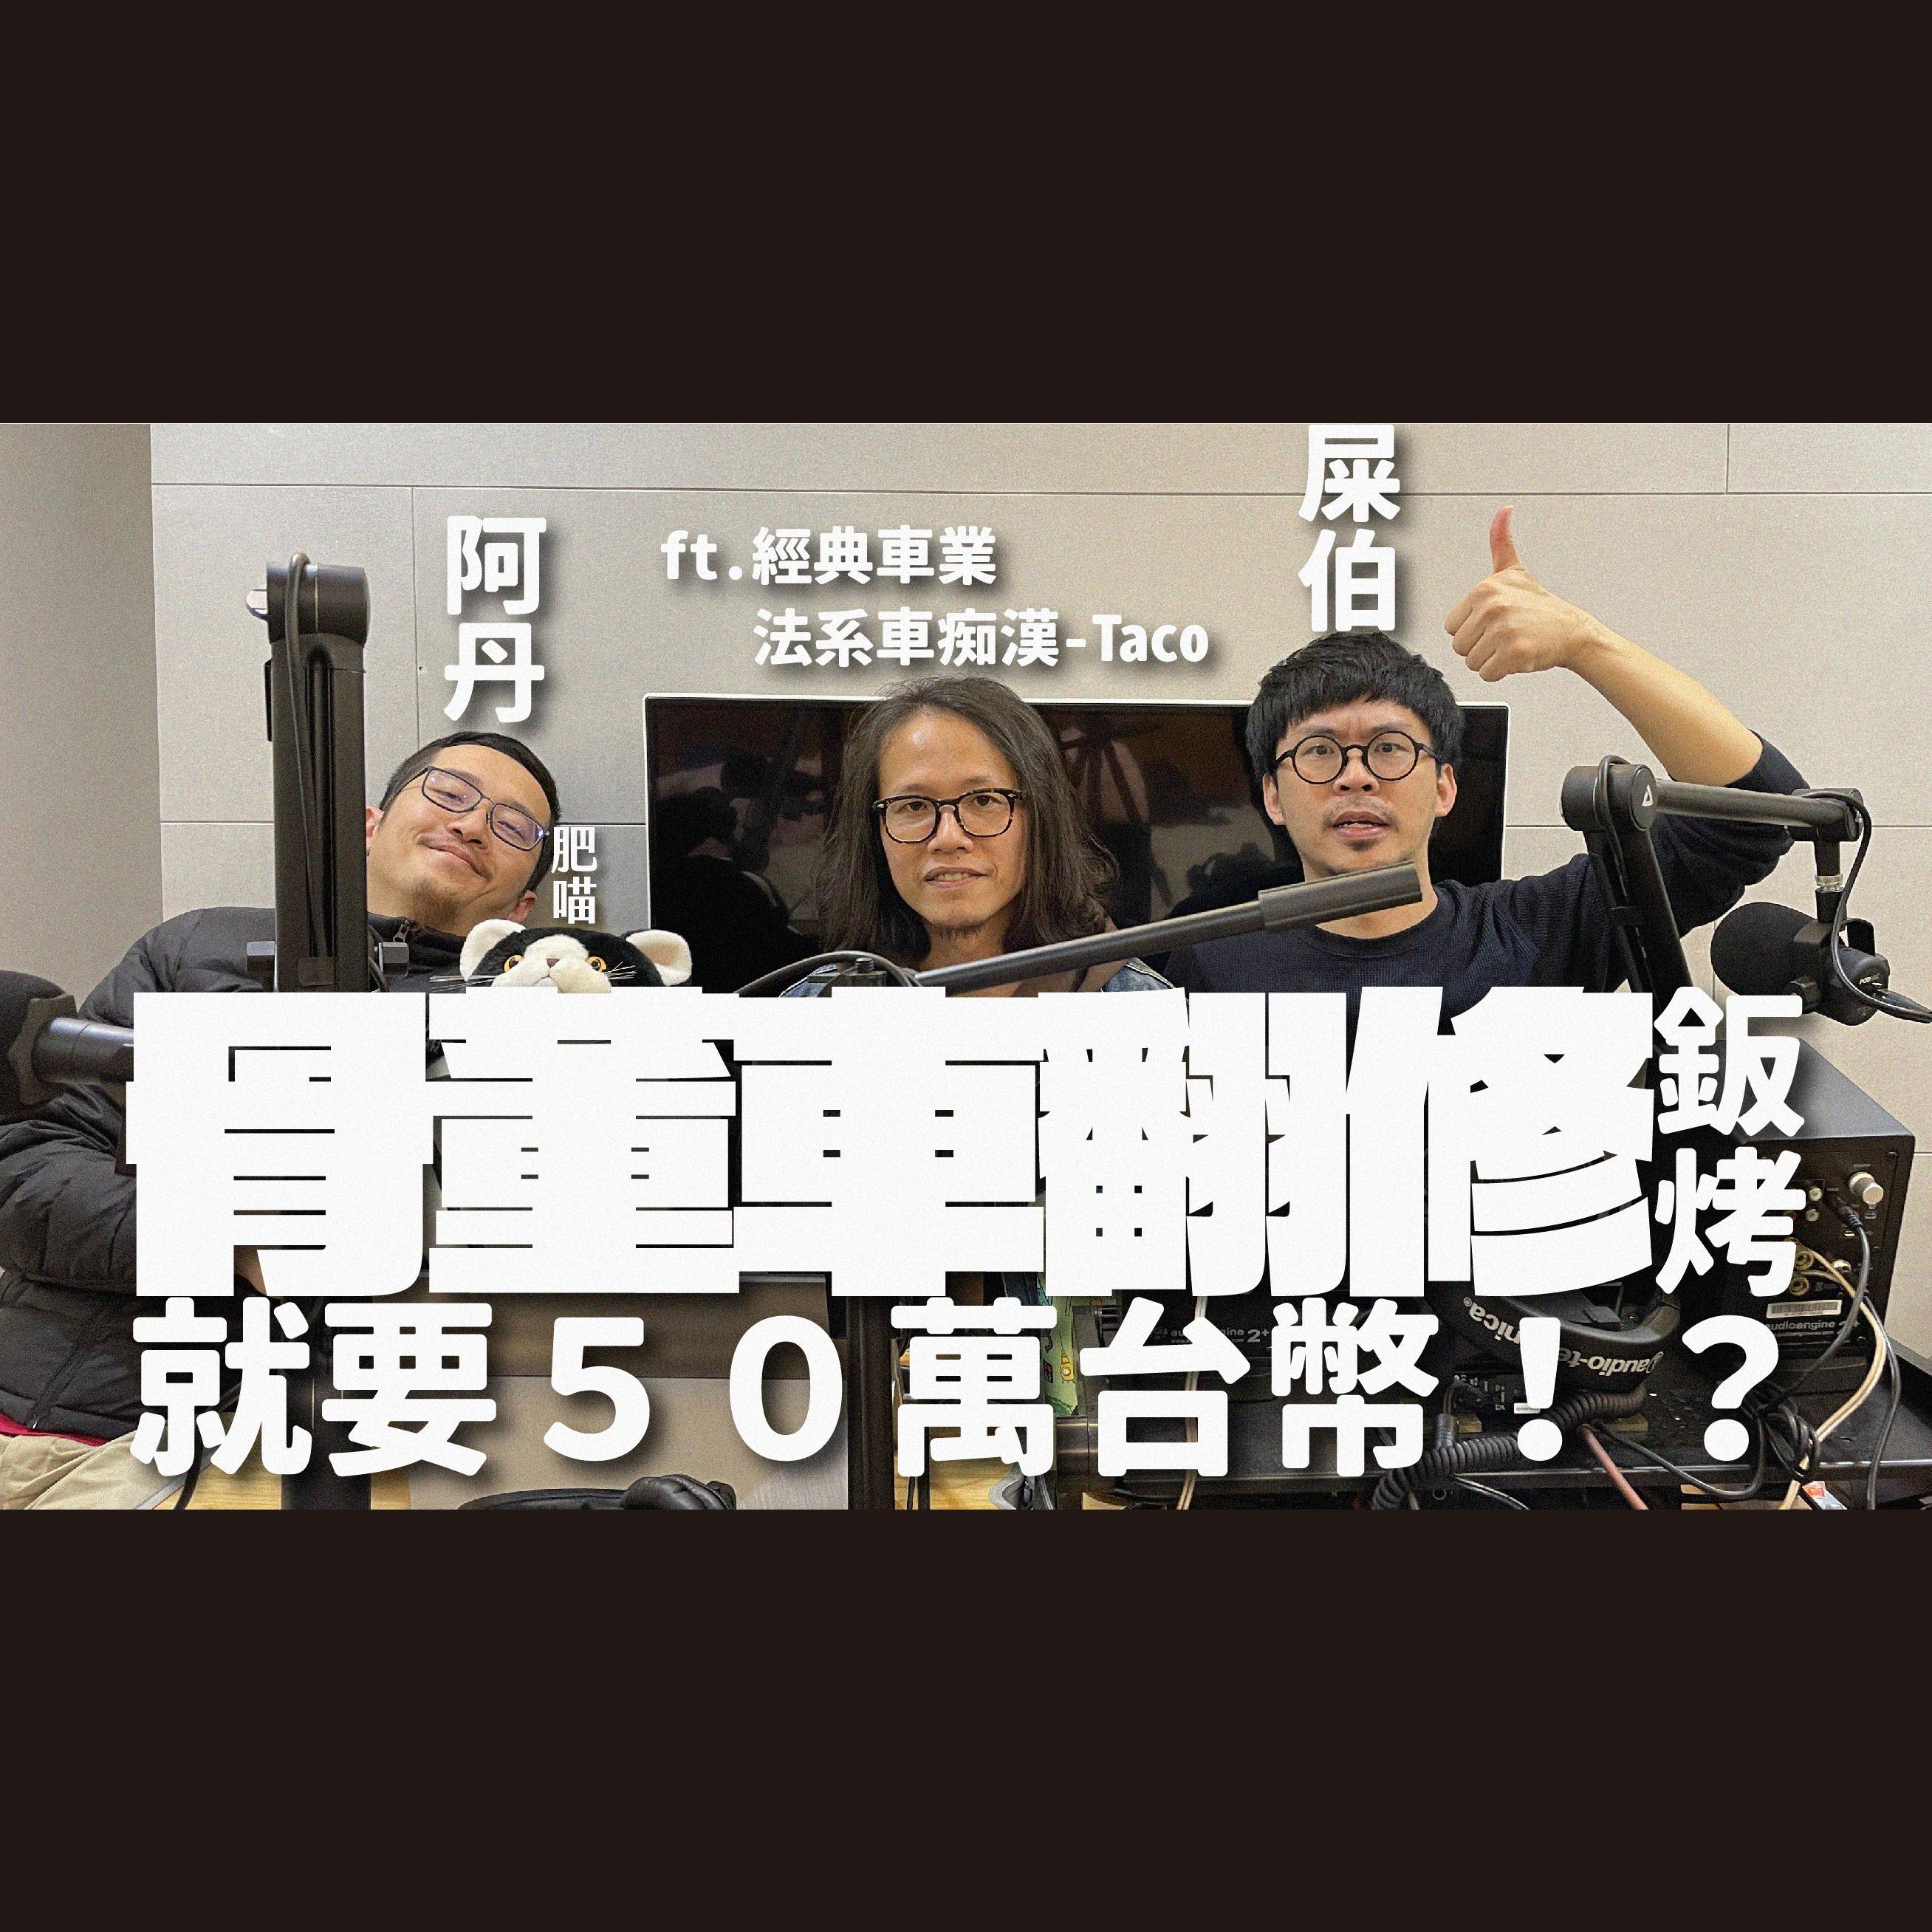 EP23|(上集) 骨董車翻修 鈑烤就要50萬台幣!?ft.經典車業 恰如其分的法系車痴漢 - Taco